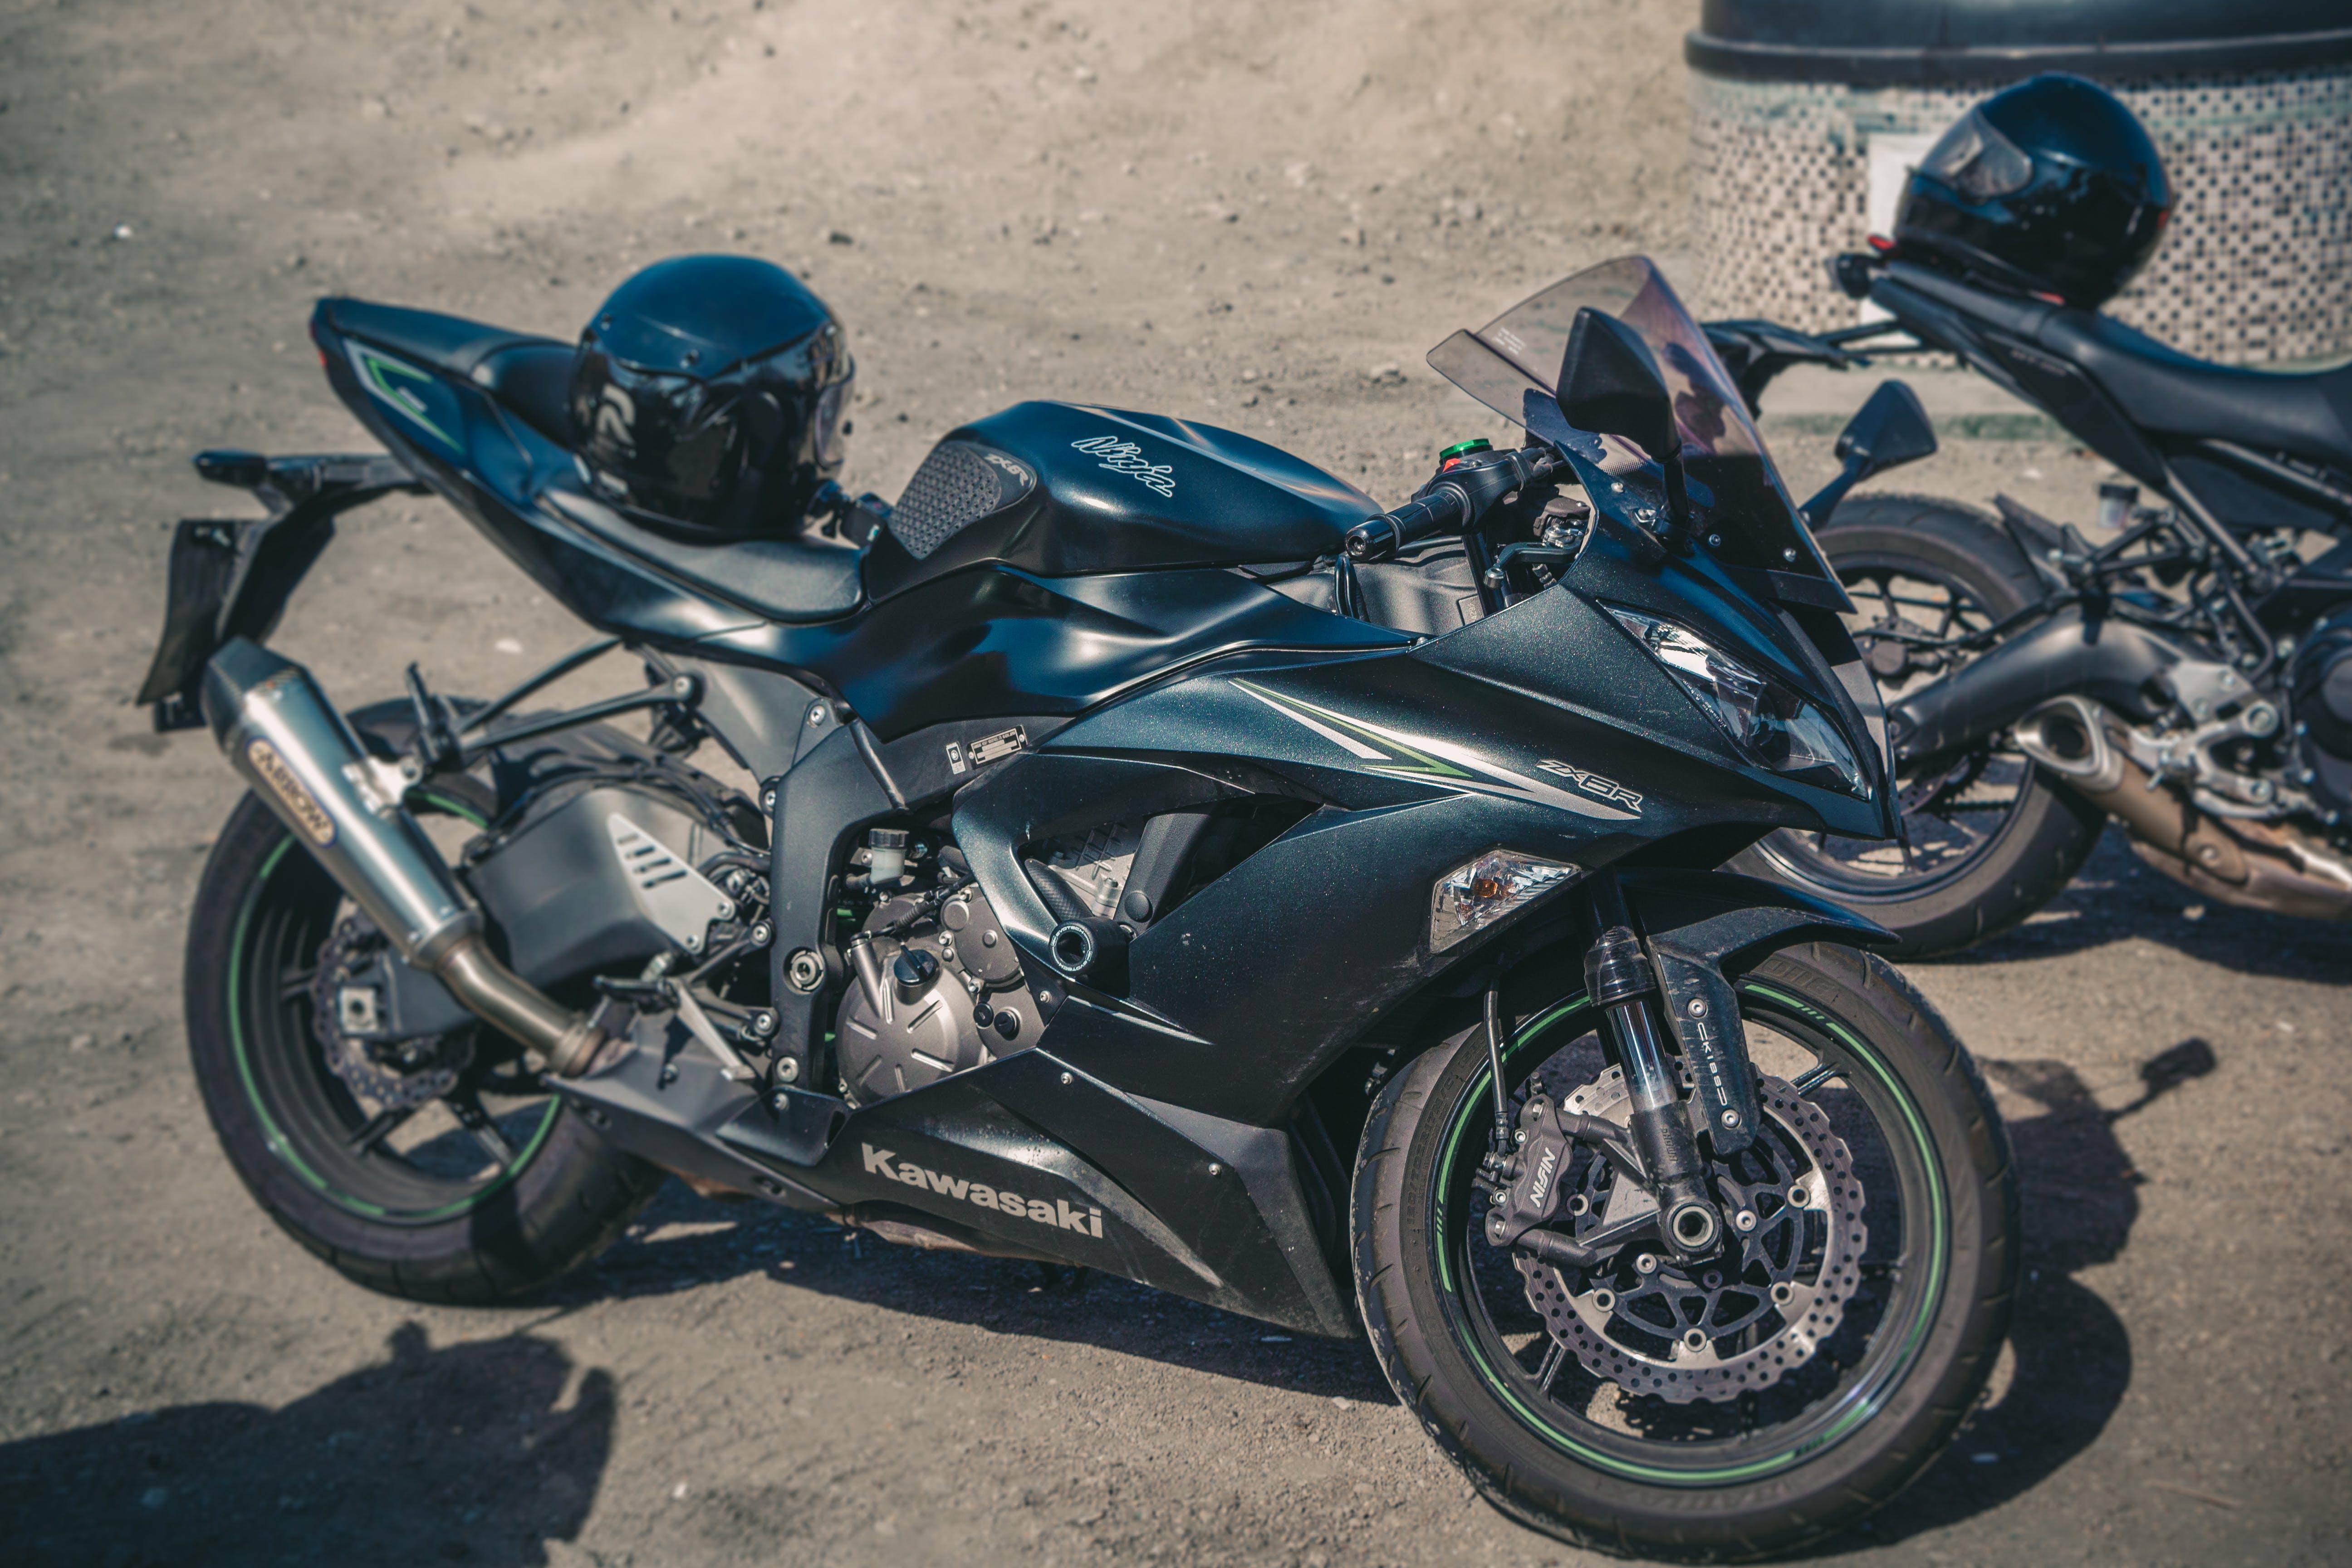 Free stock photo of bike, motorcycle, machine, motorcycle engine